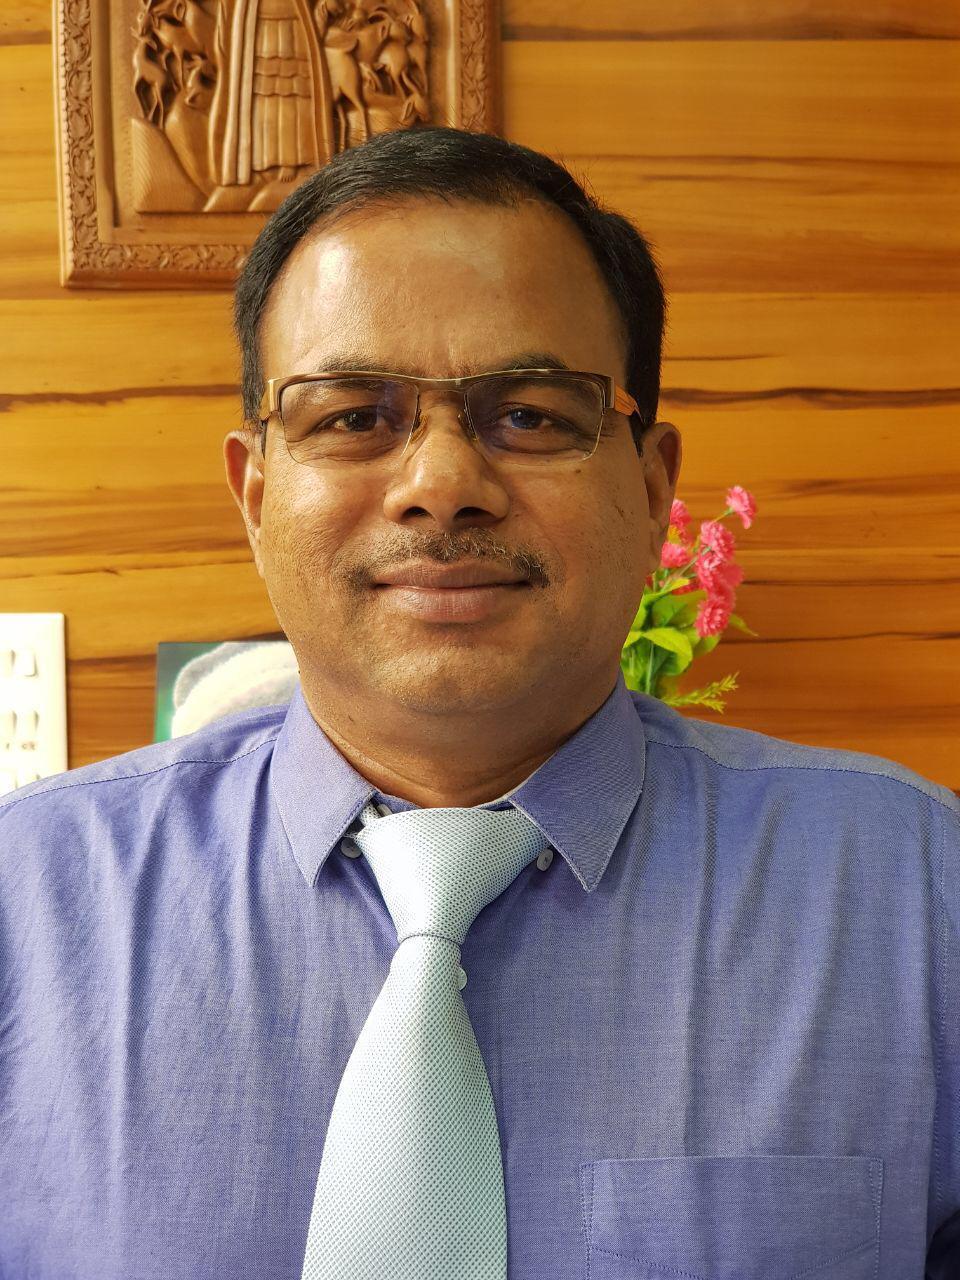 Rajendra Suryawanshi